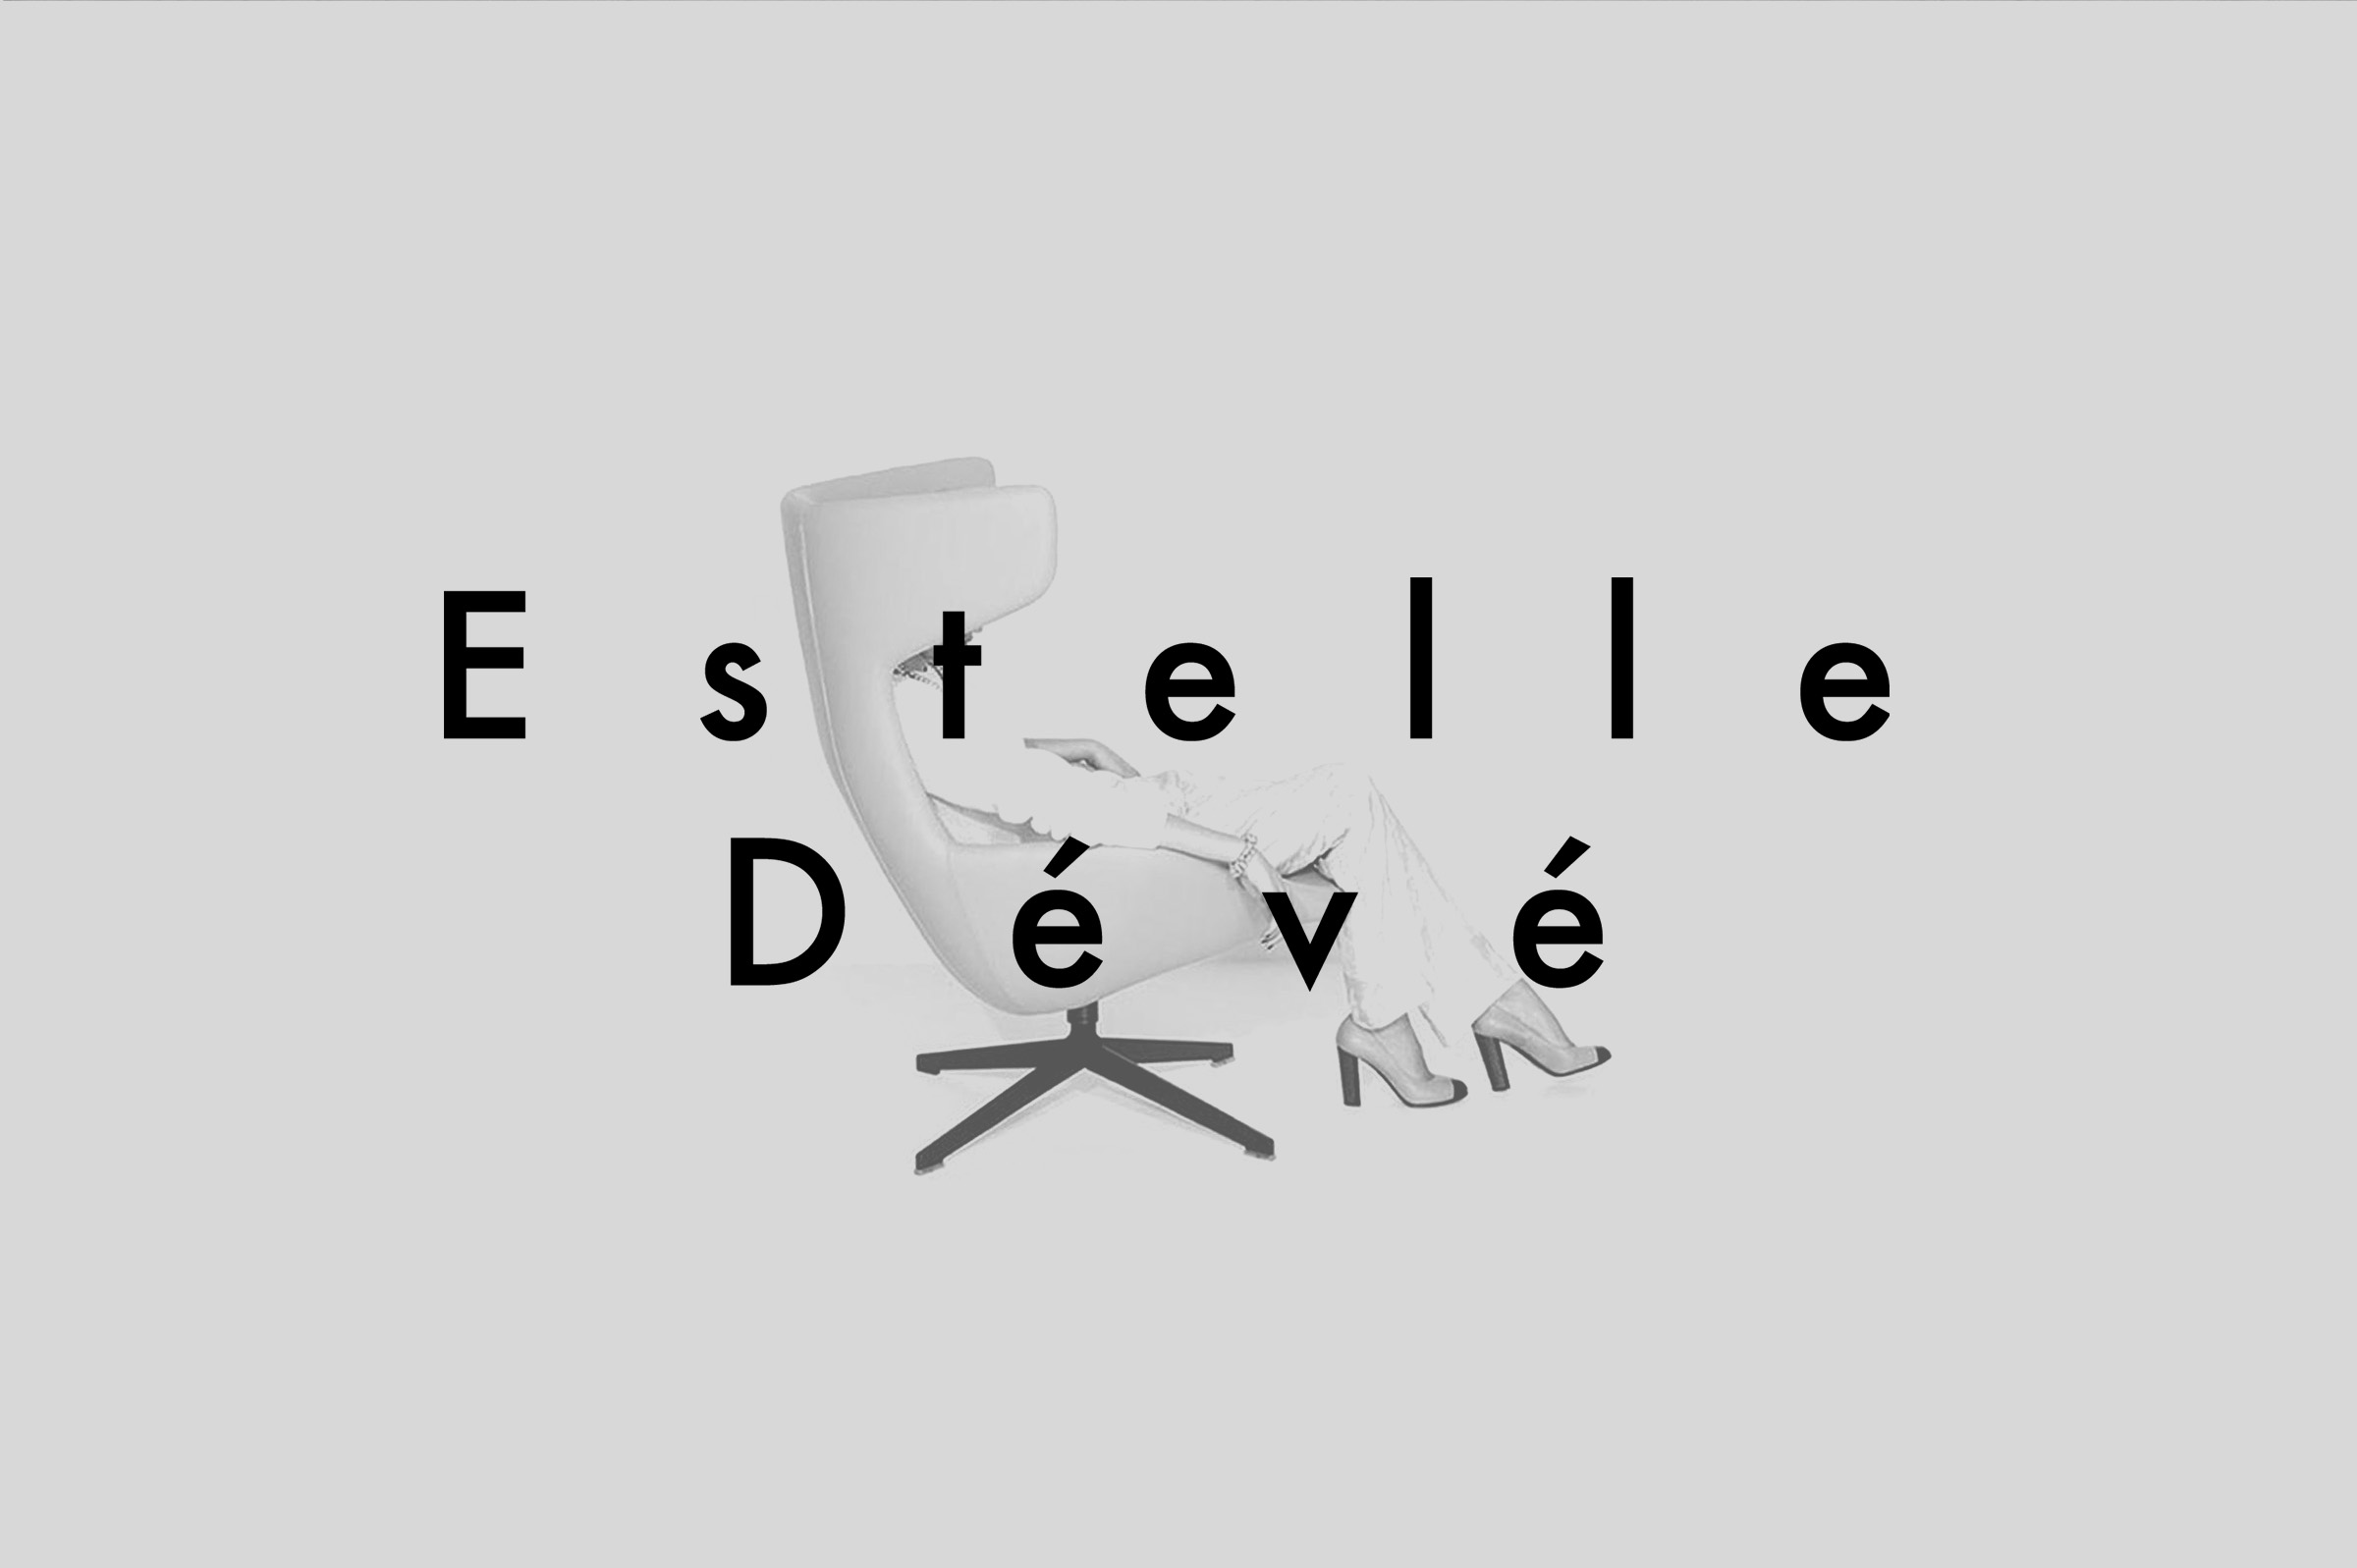 Anchor_Agency_estelle_deve_overlay.jpg